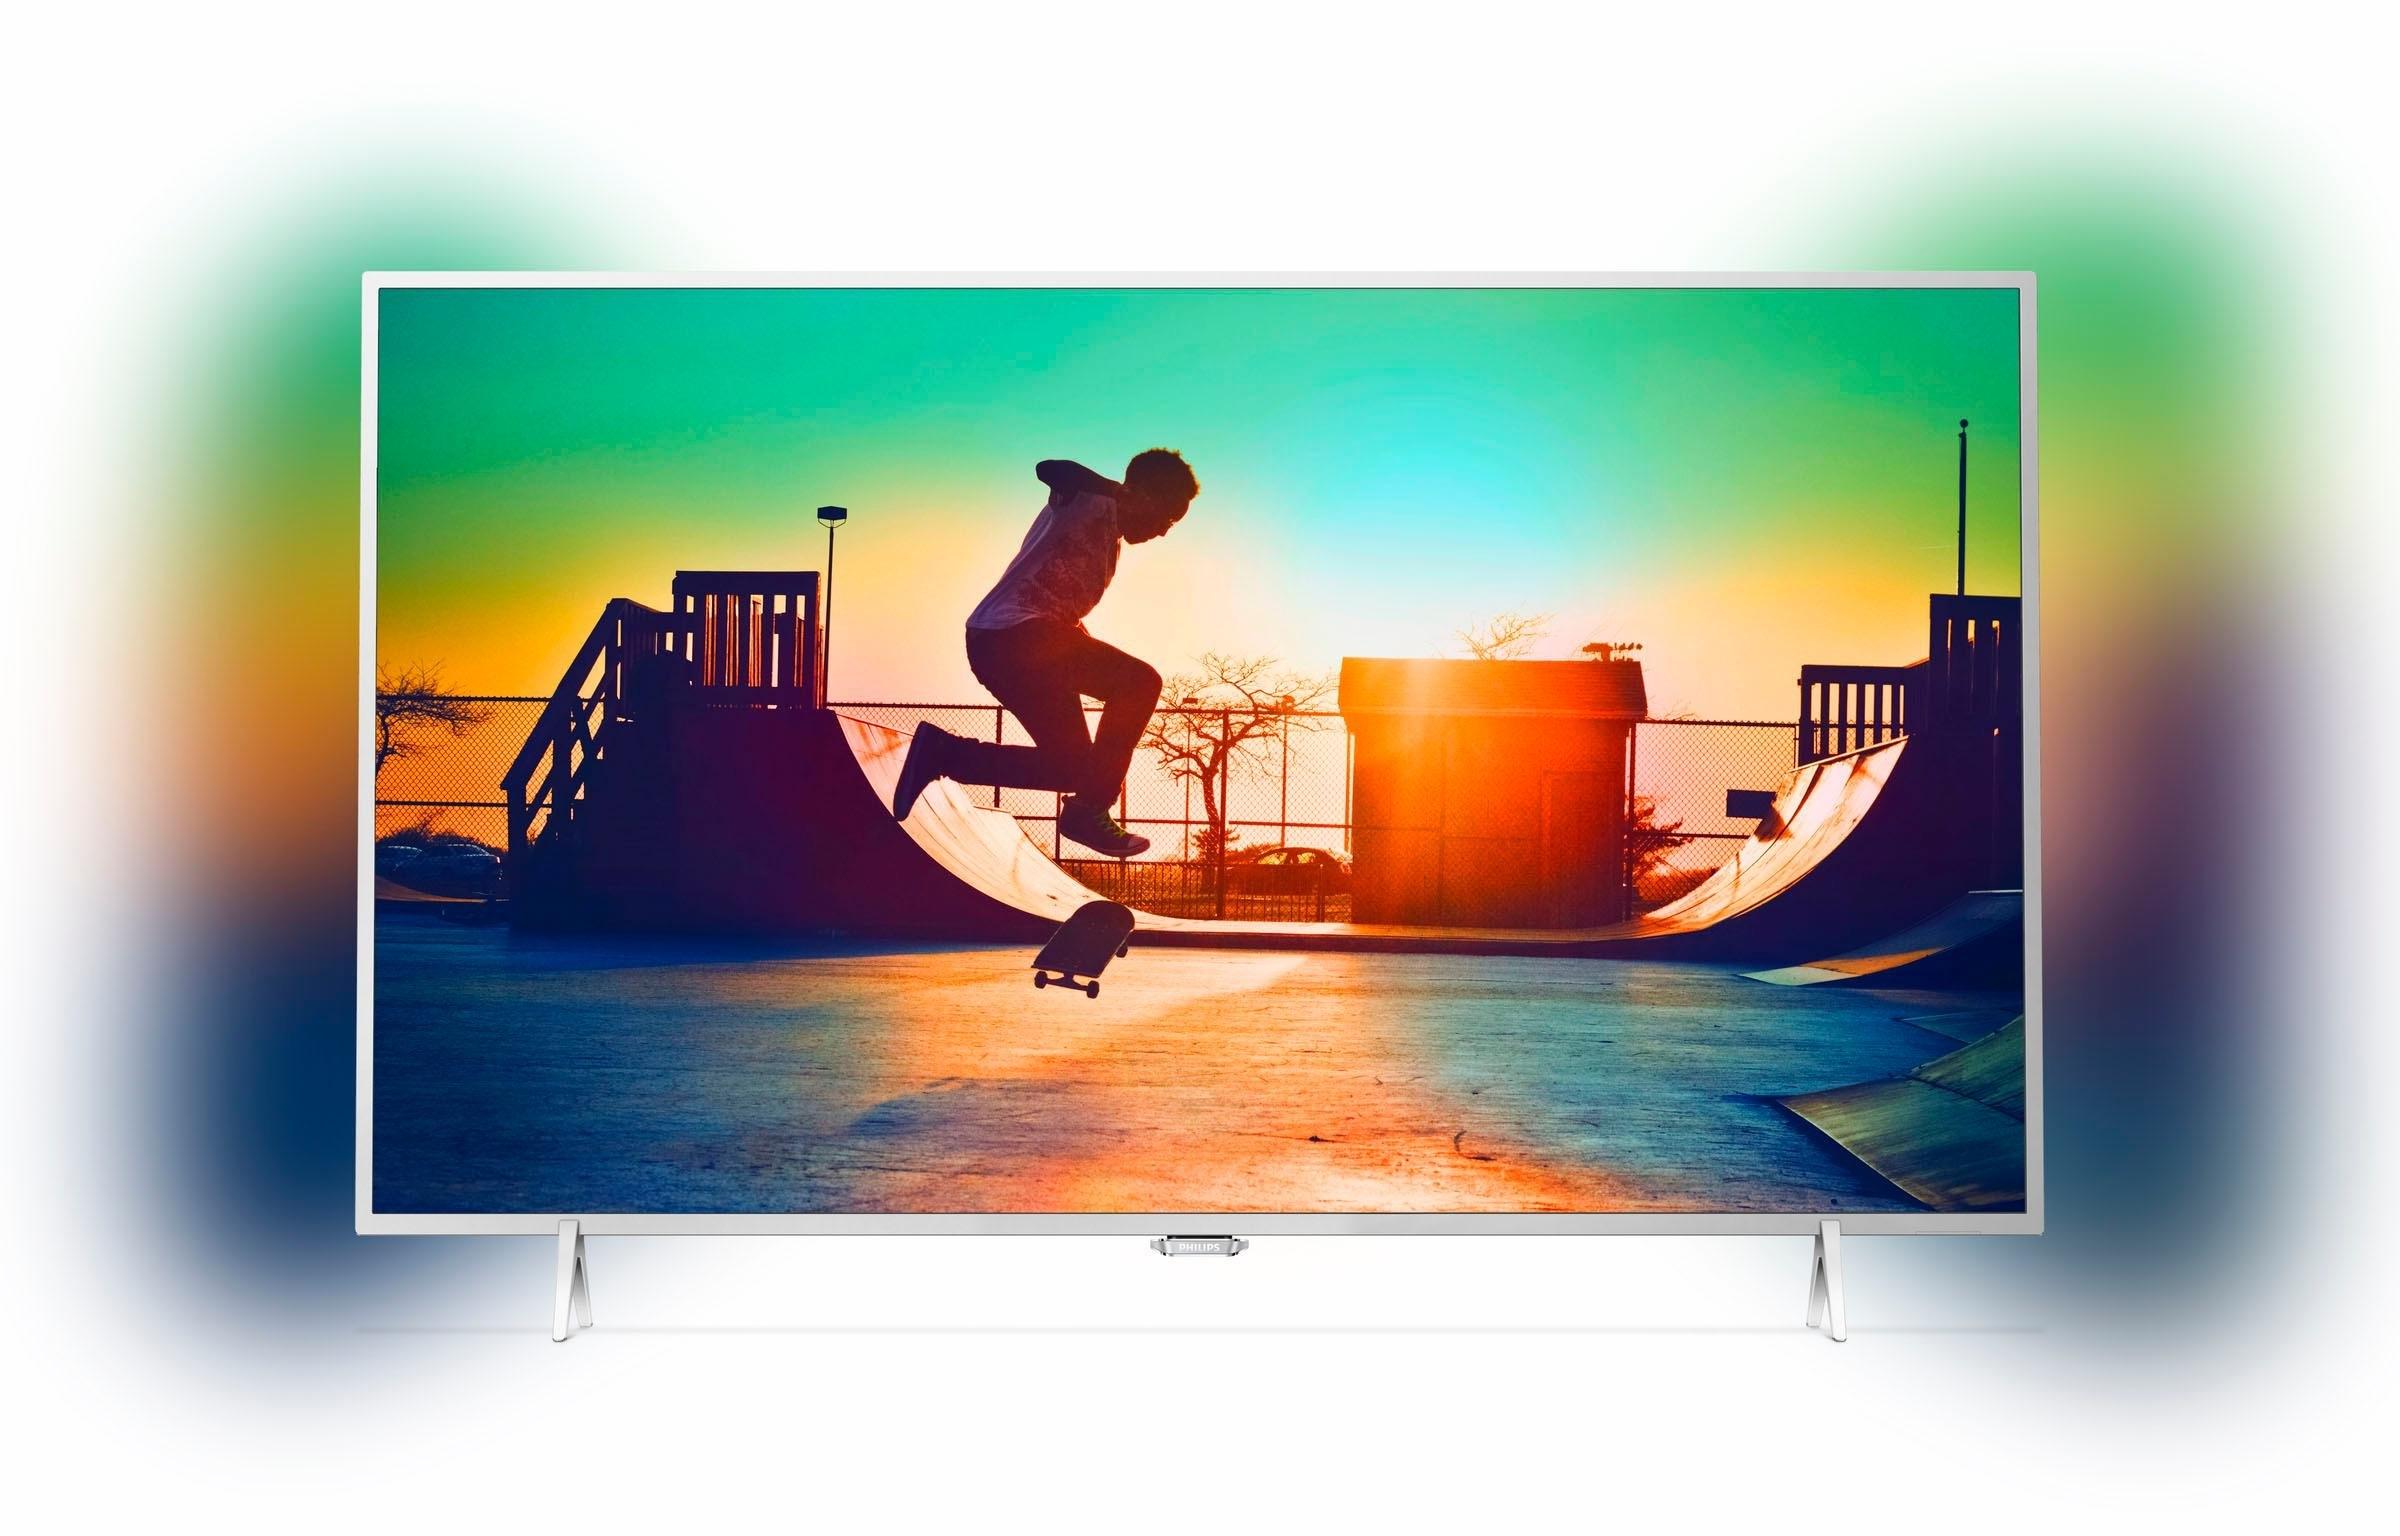 Philips 32PFS6402/12 LED-TV (80 cm / (32 inch)), 4K Ultra HD, Smart TV goedkoop op otto.nl kopen